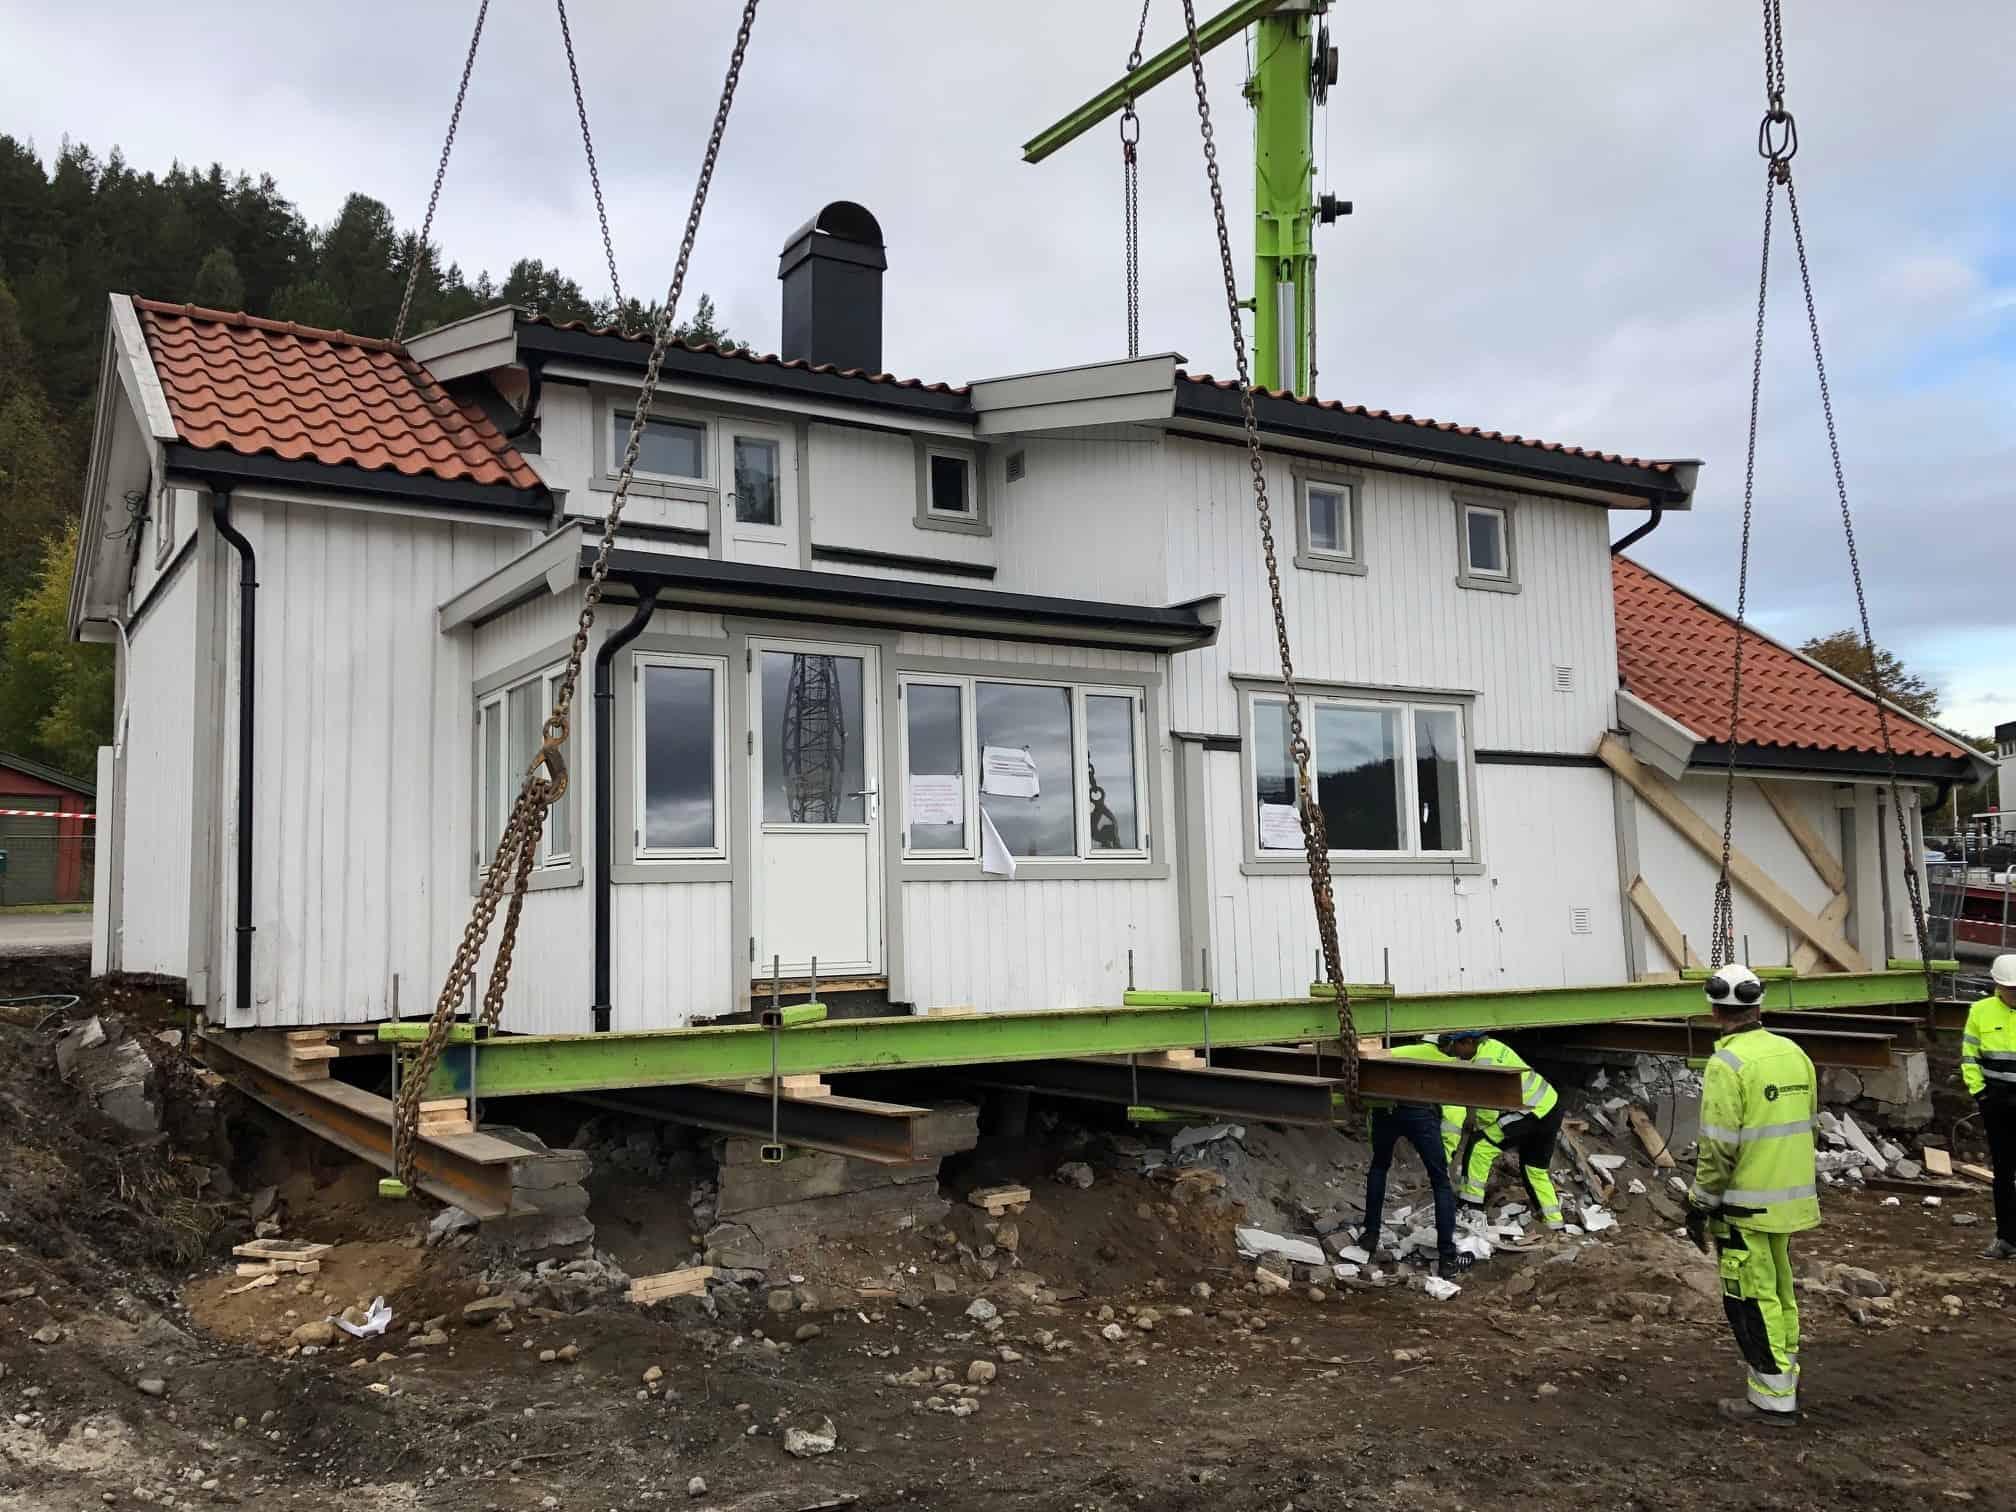 Kynningsrud Nordic Crane flytter hus